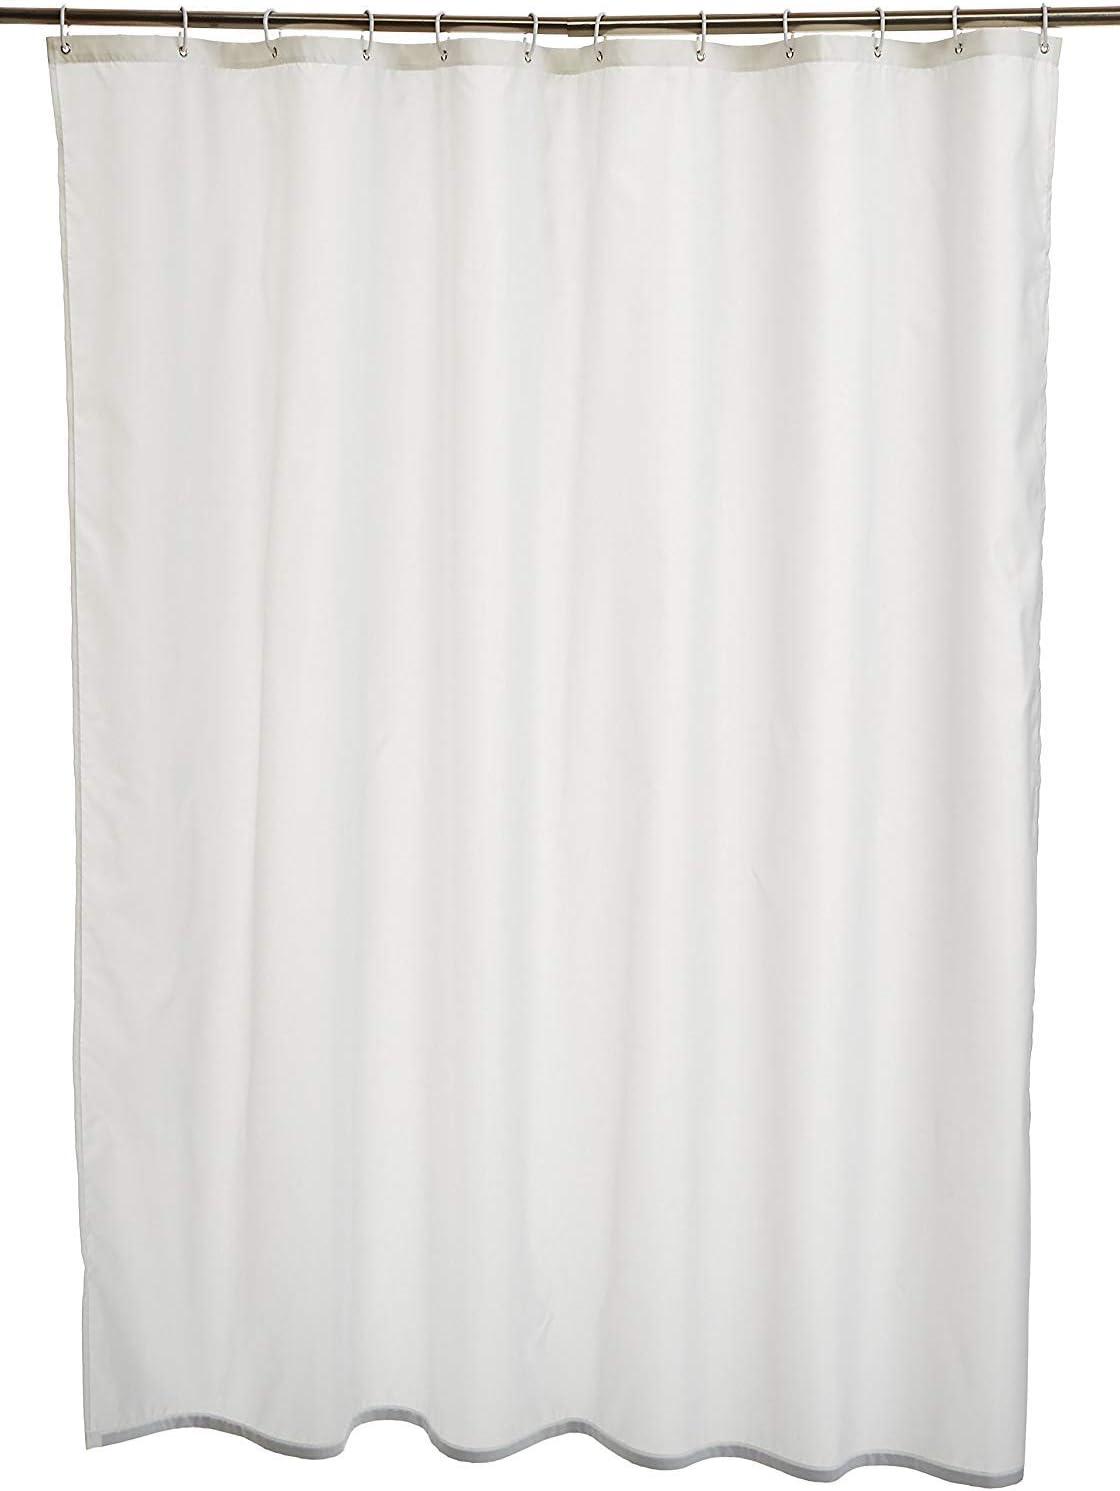 Amazon Basics Printed Fabric Shower Curtain,White,180 x 200cm 180 x 200cm White